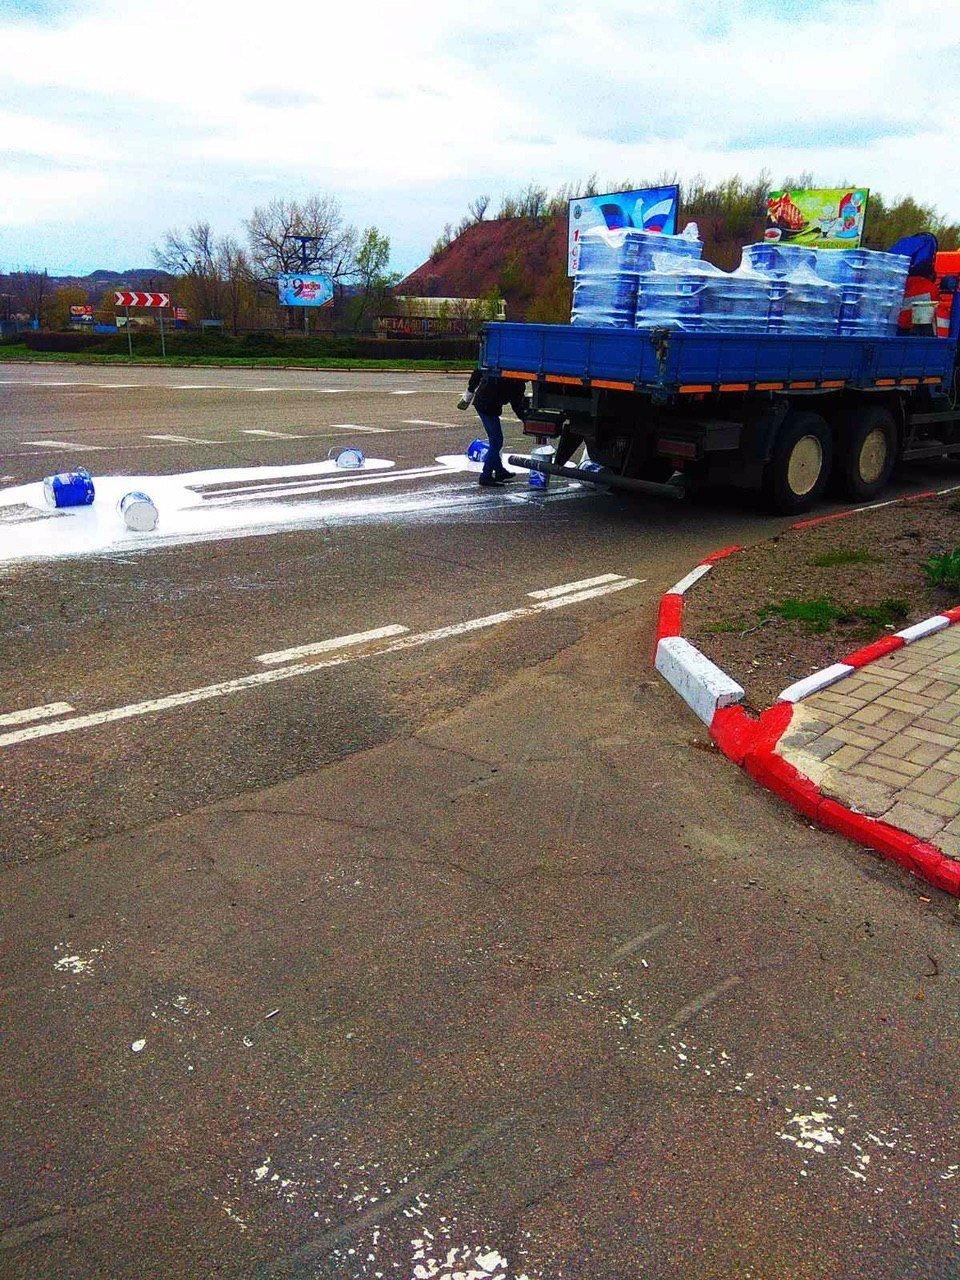 В Донецке на дорогу вылилось 20 ведер краски, - ФОТО, фото-1